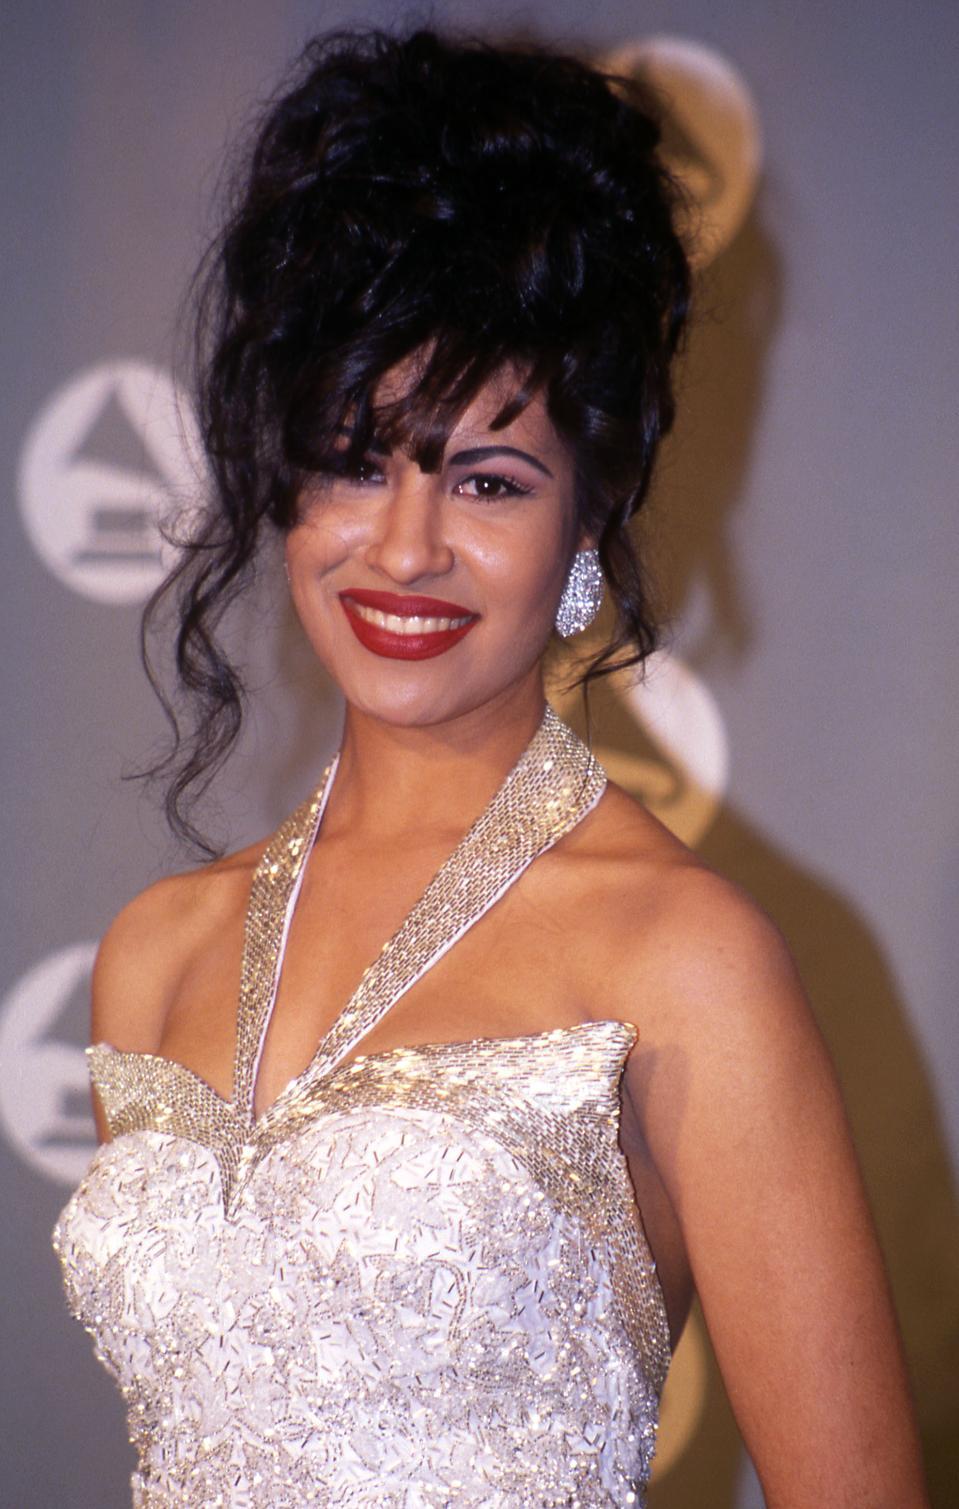 Twenty Five Years After Her Murder Tejano Singer Selena Still Matters